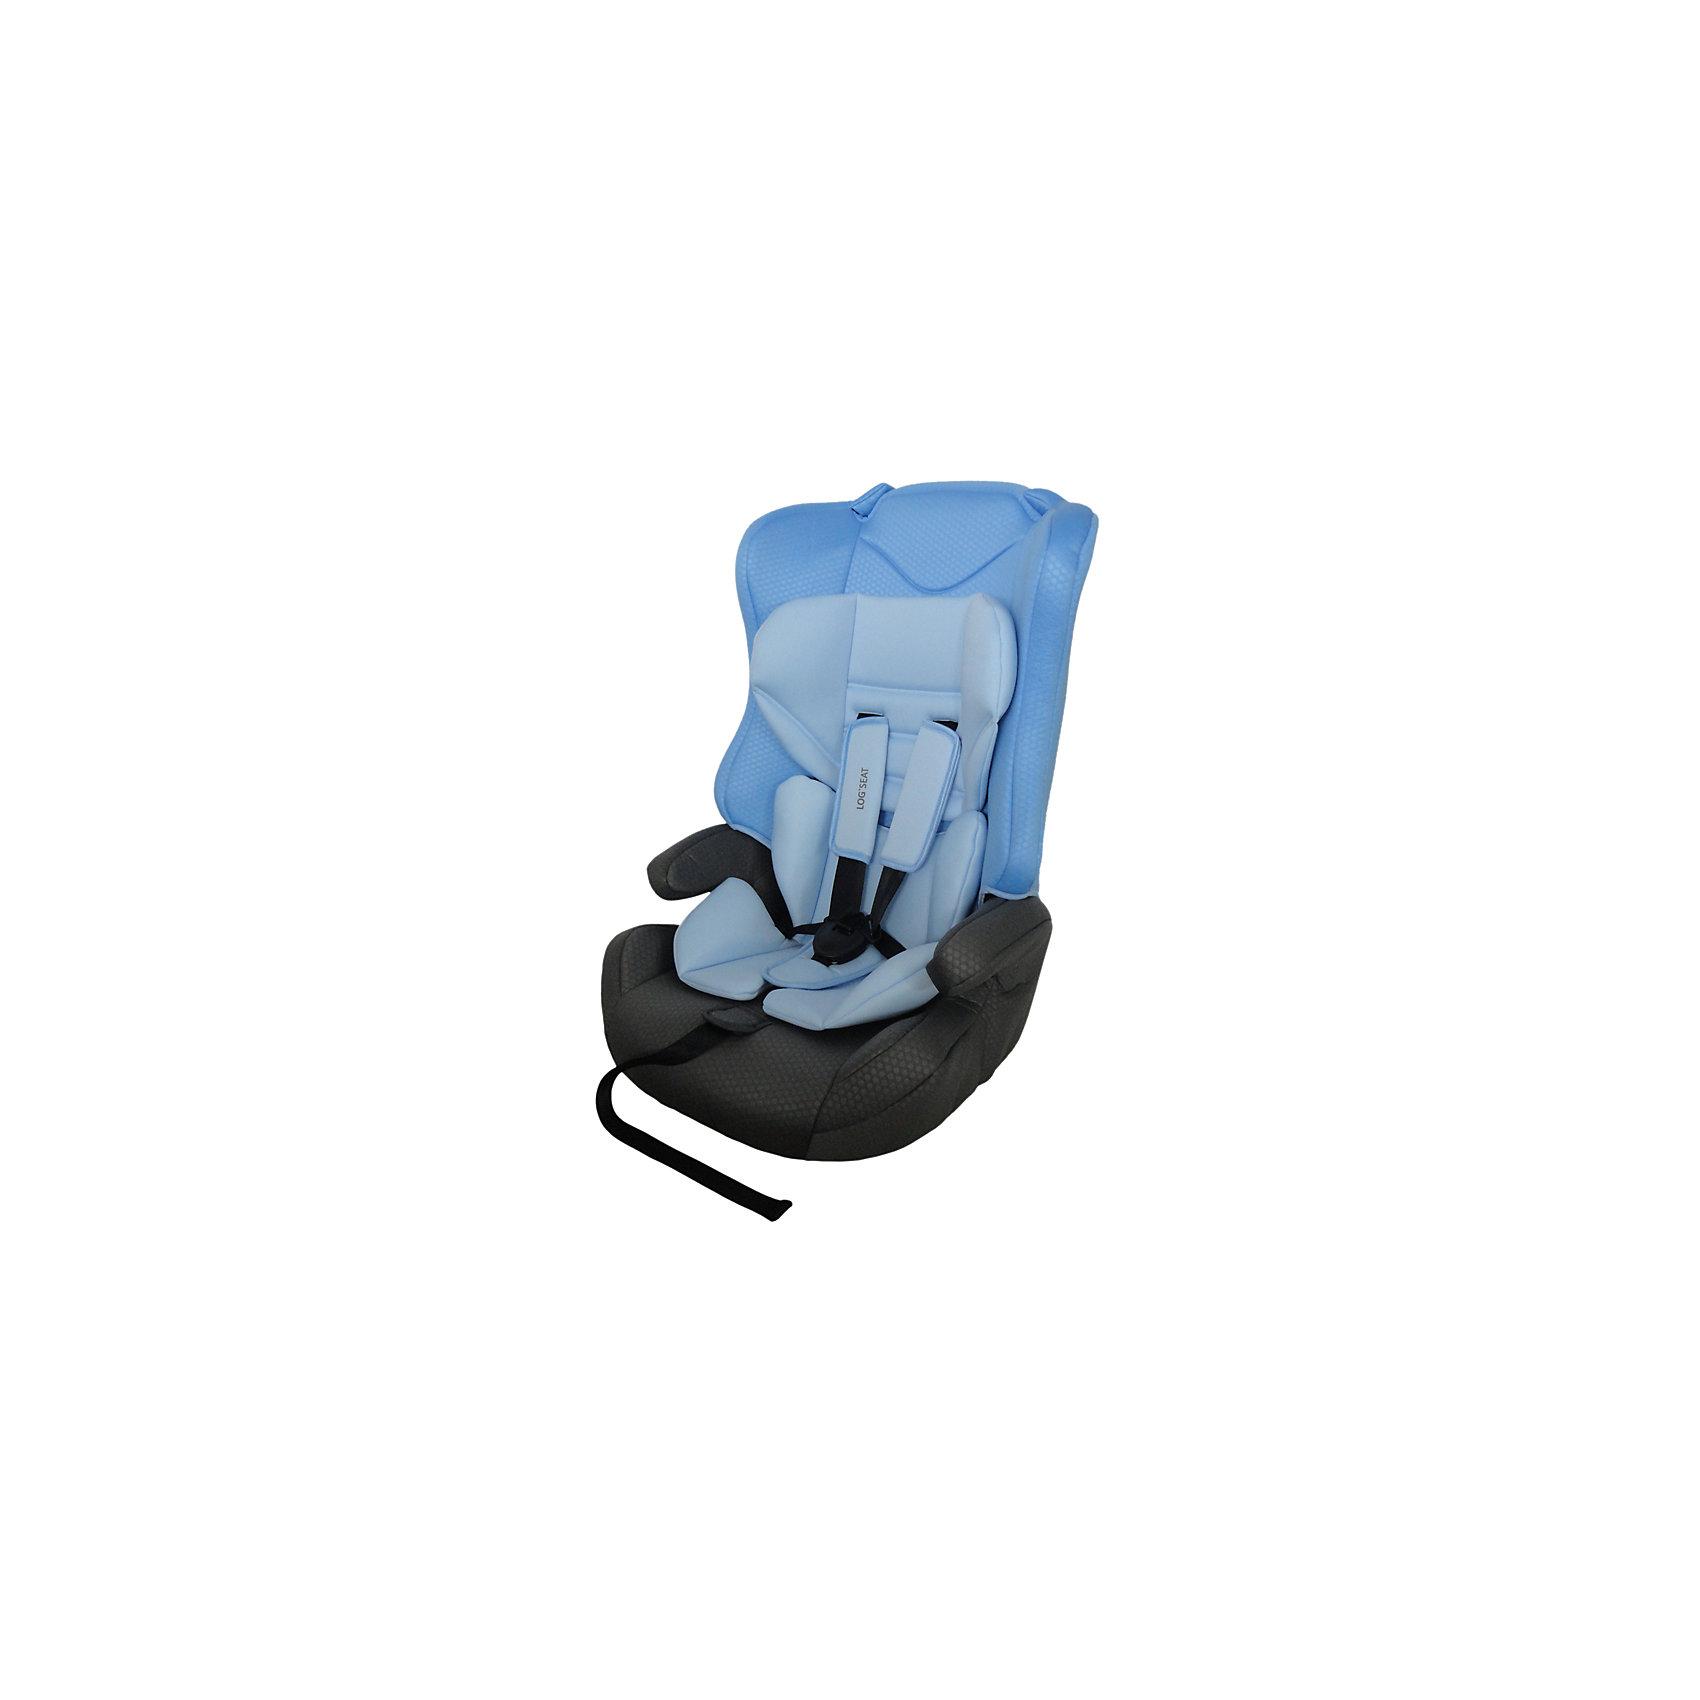 Baby Hit Автокресло Log's Seat 9-36 кг., Babyhit, серо-голубой e36 pnp sword fiber glass racing speed rc boat w 1750kv brushless motor 120a esc servo boat green